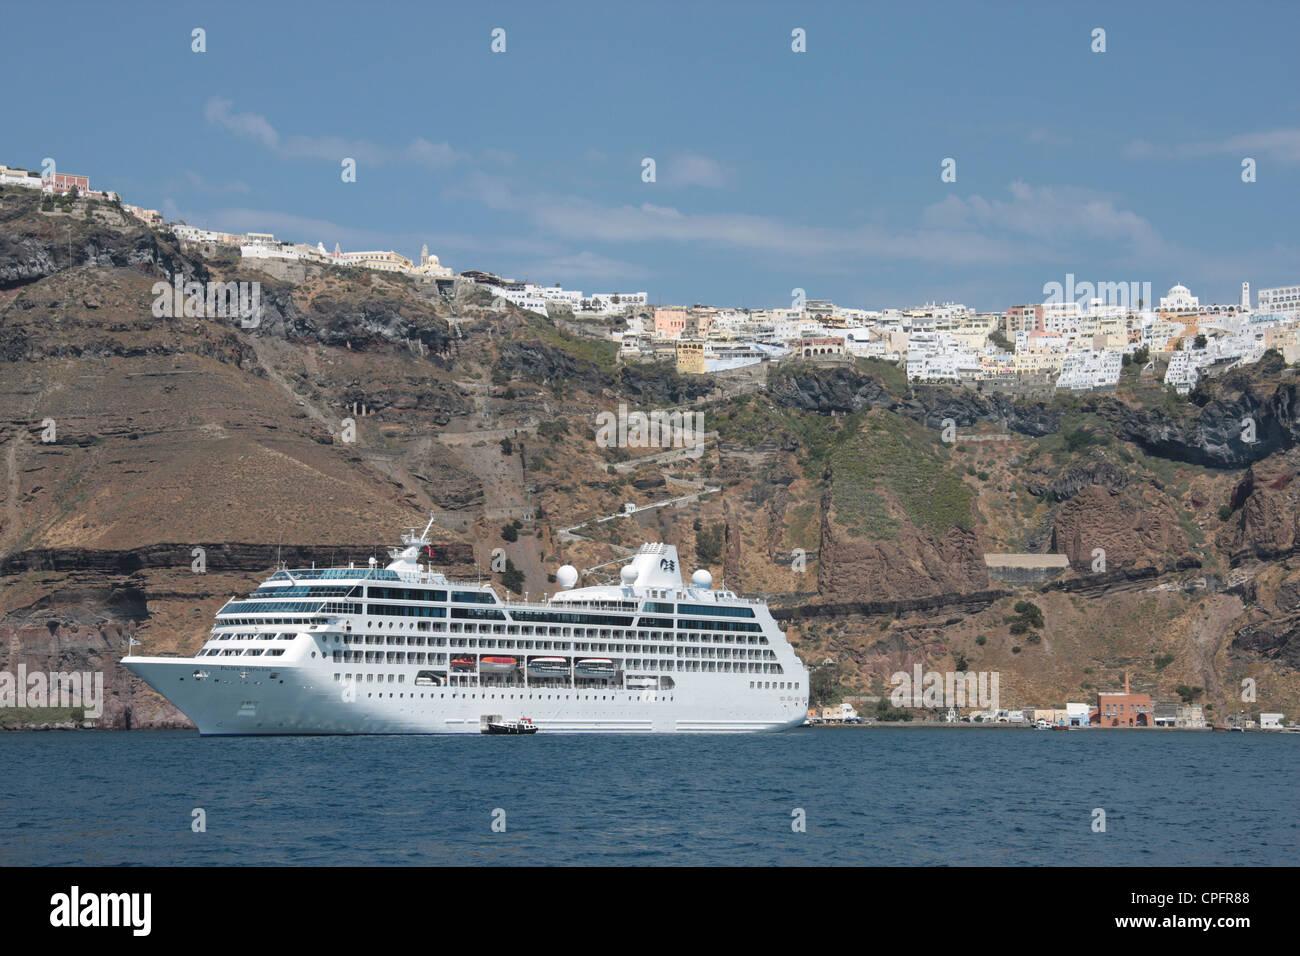 Cruise ship Pacific Princess at anchor in Santorini - Stock Image